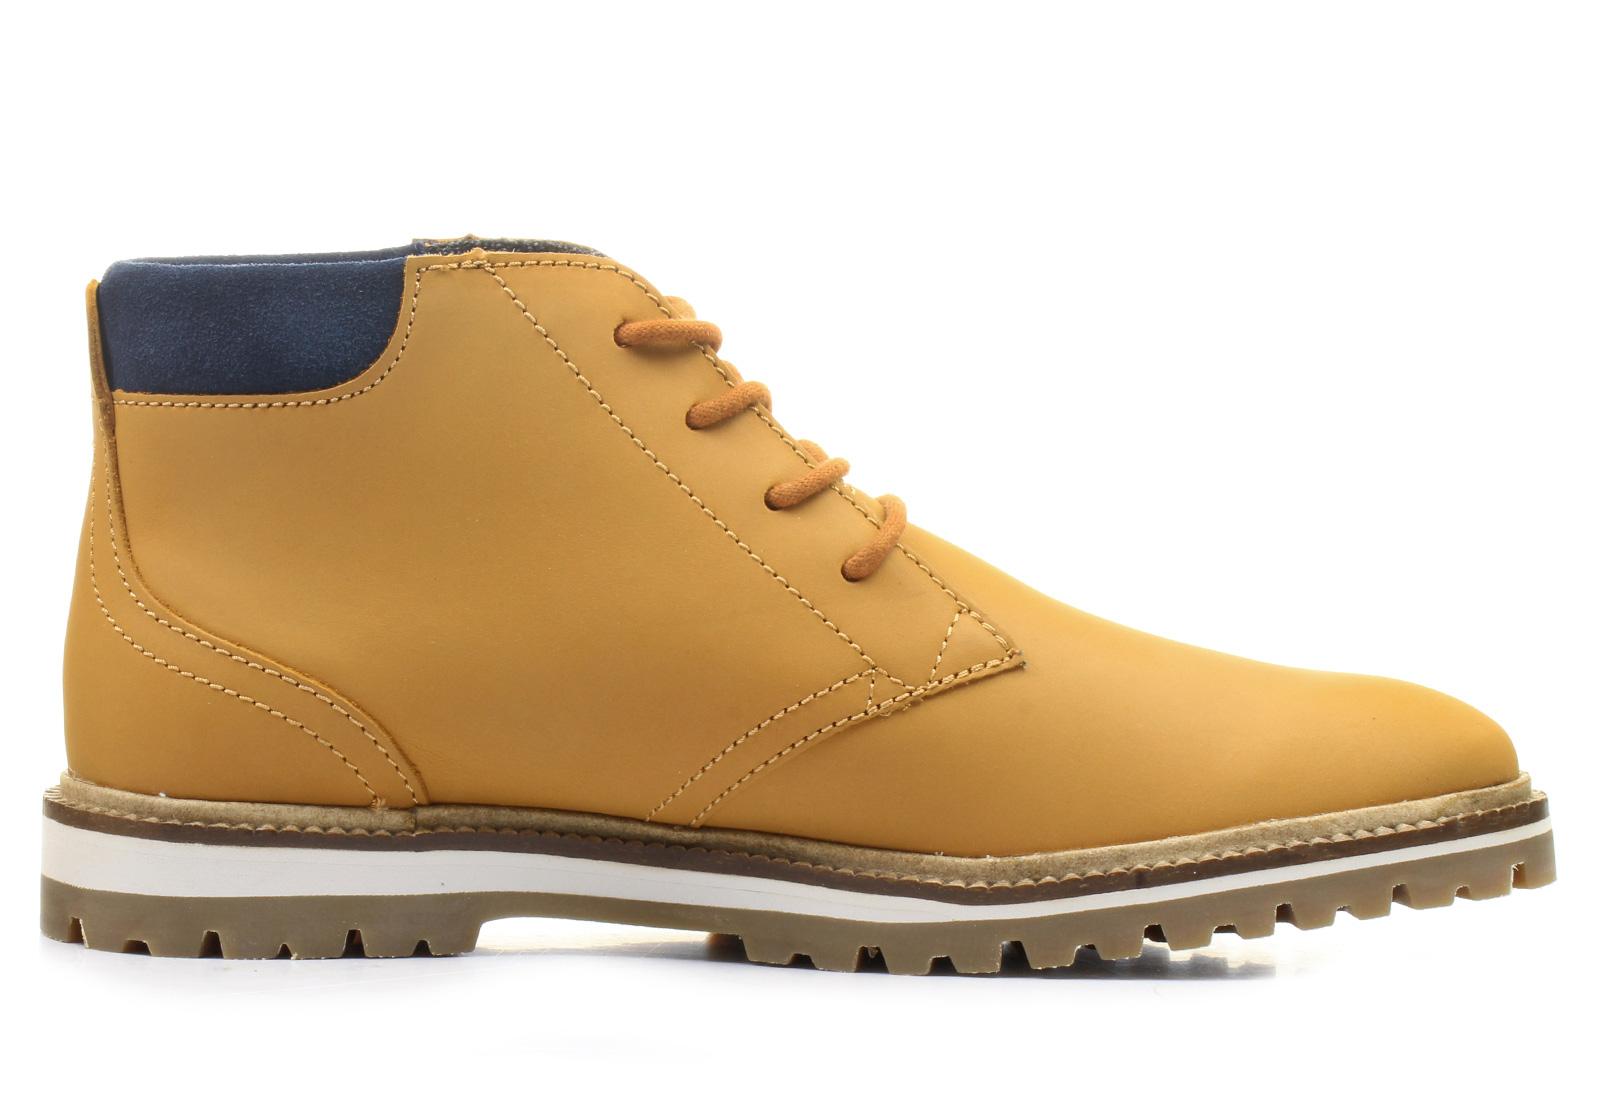 Lacoste Bakancs - Montbard Chukka - 153srm0018-013 - Office Shoes ... 67cb7cd834